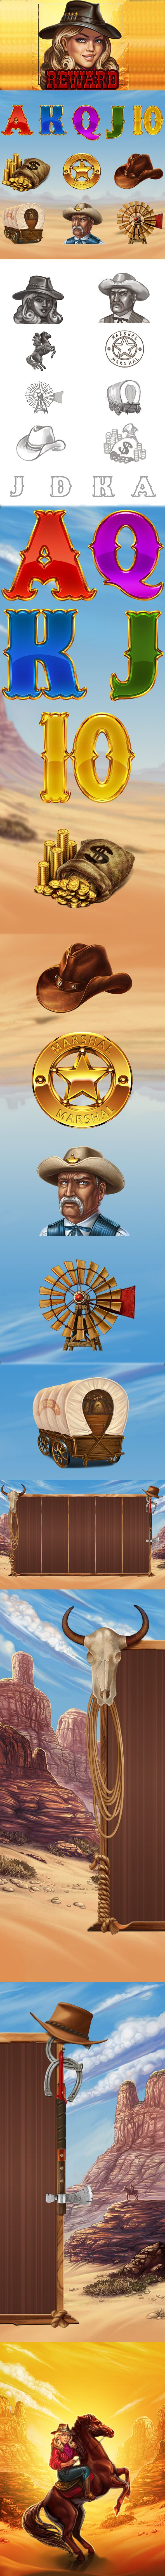 Slot-machine - Wild west by SLOTOPAINT game design, via Behance